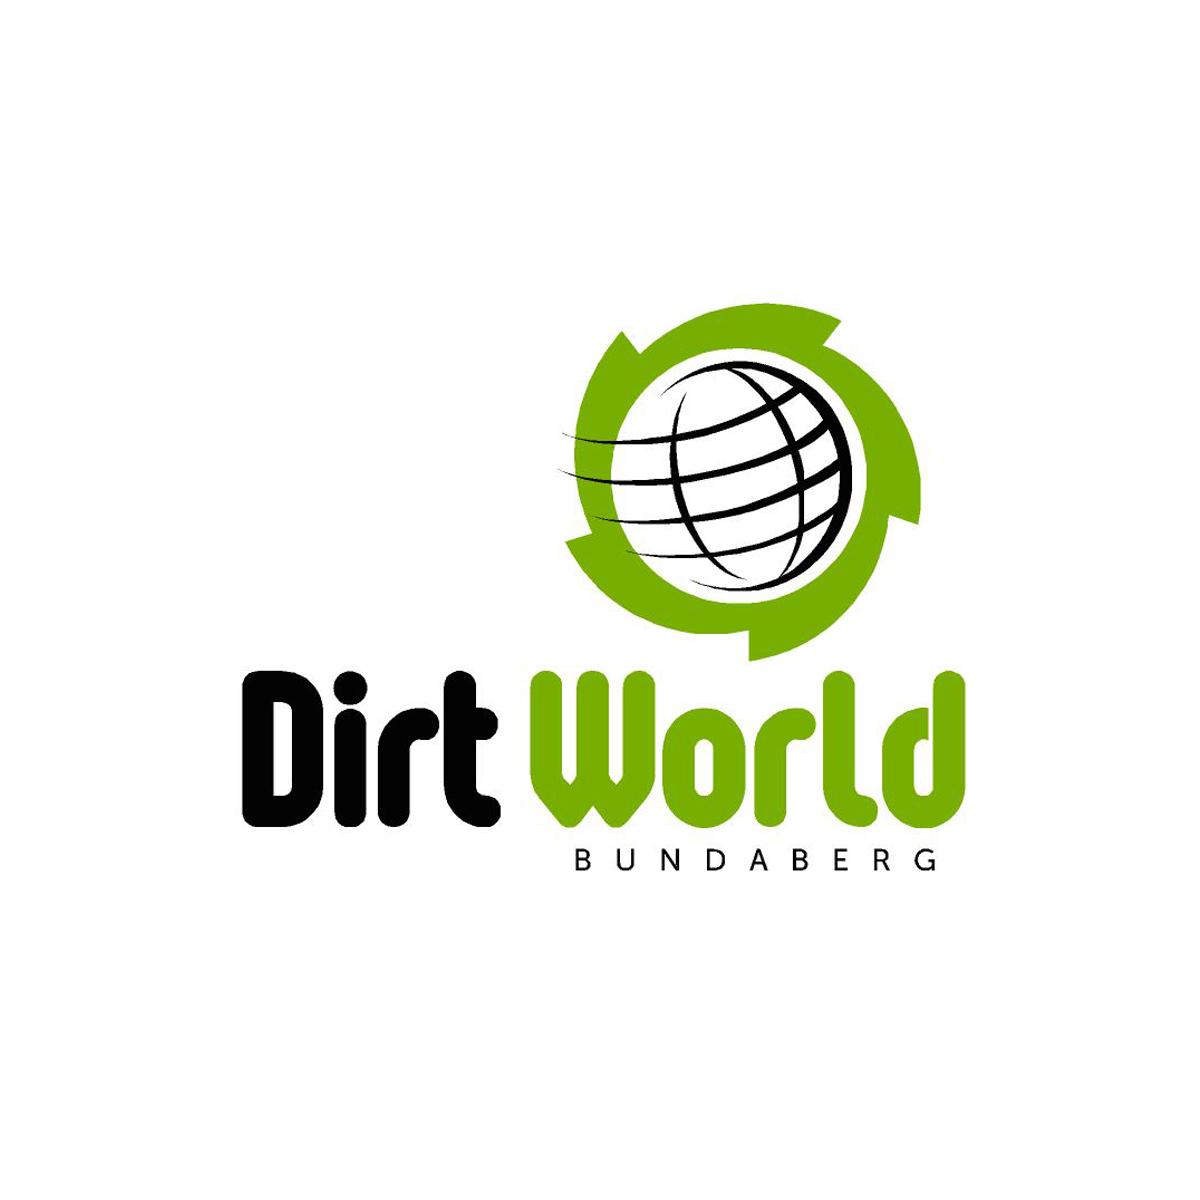 Dirtworld Logo by SignMax Bundaberg